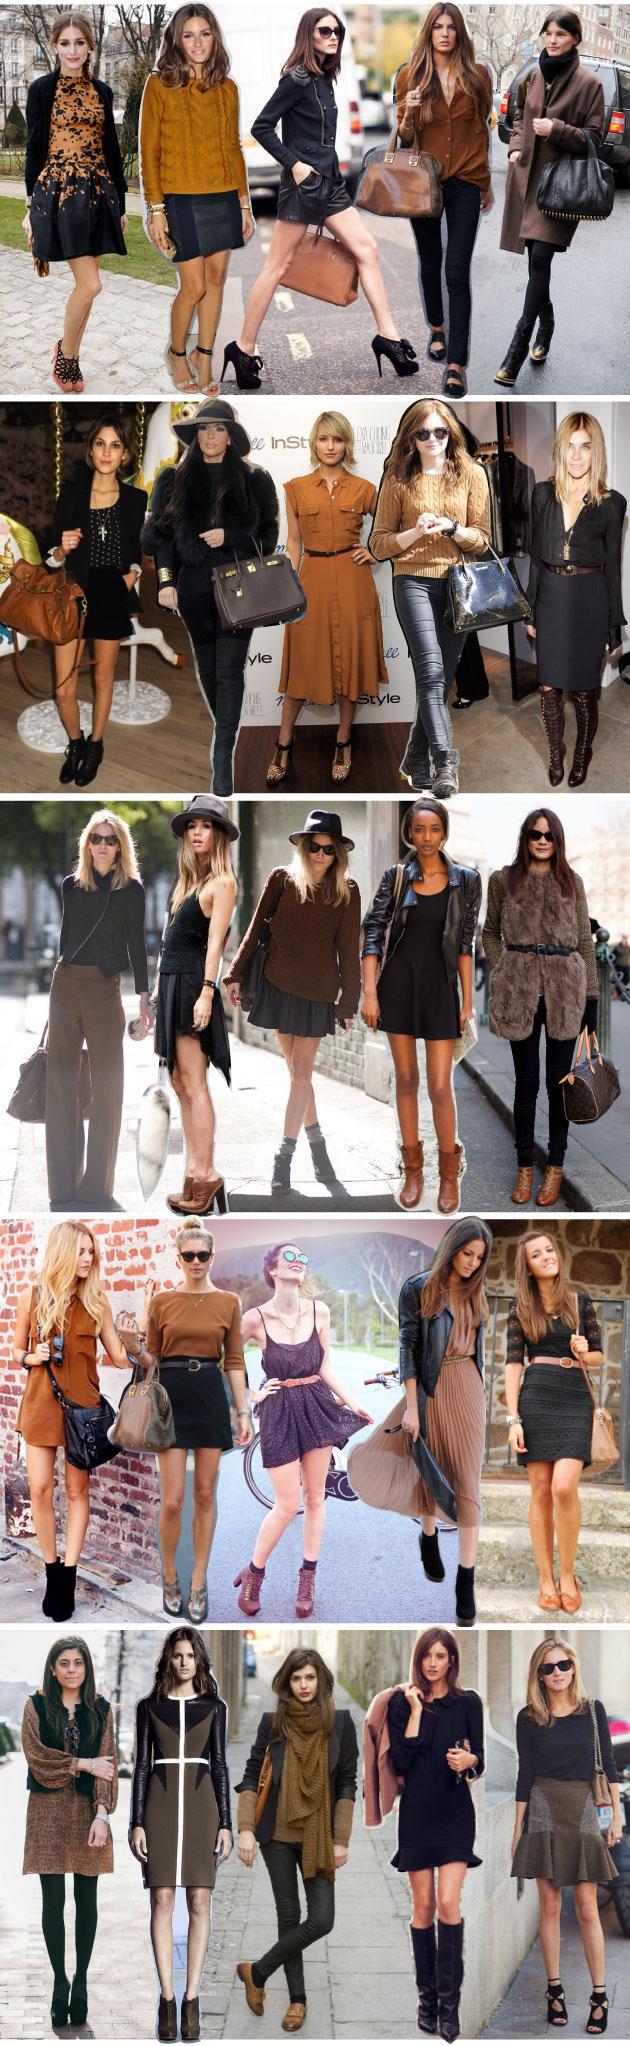 combina-marrom-preto-looks-brown-black-estilo-street-style-2